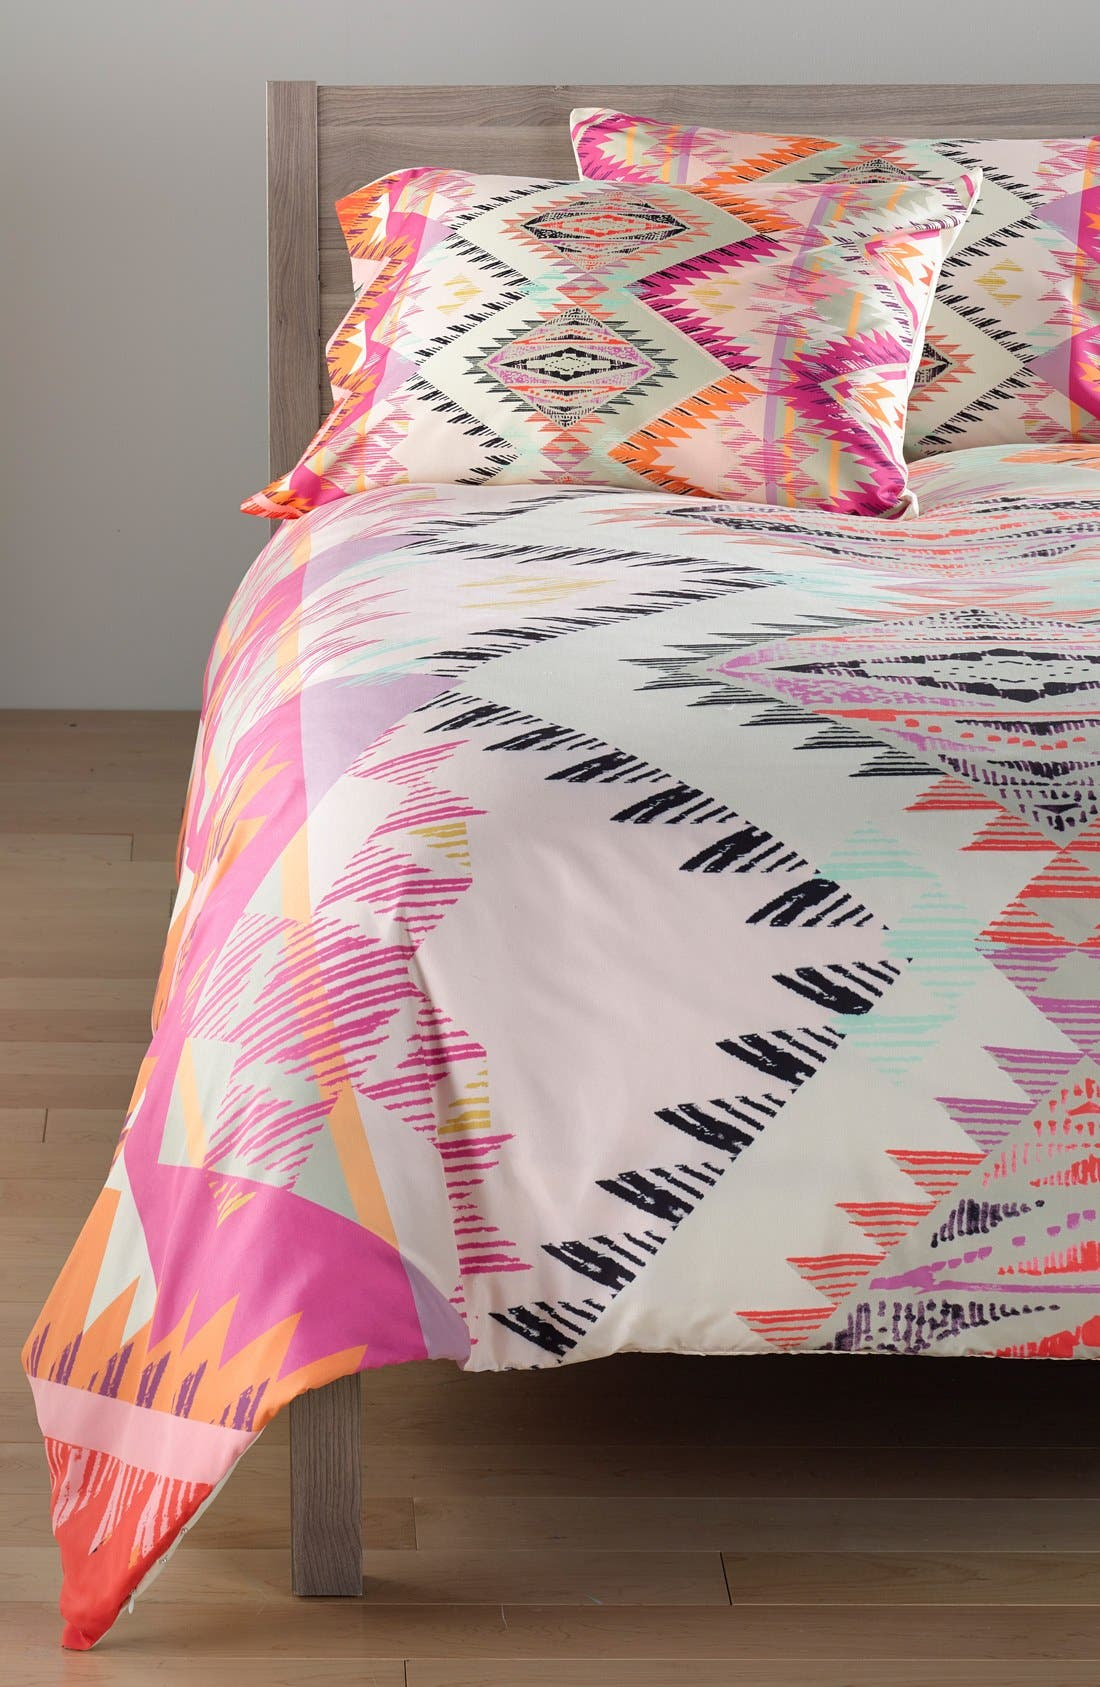 DENY DESIGNS Pattern State Marker Sun Duvet Cover